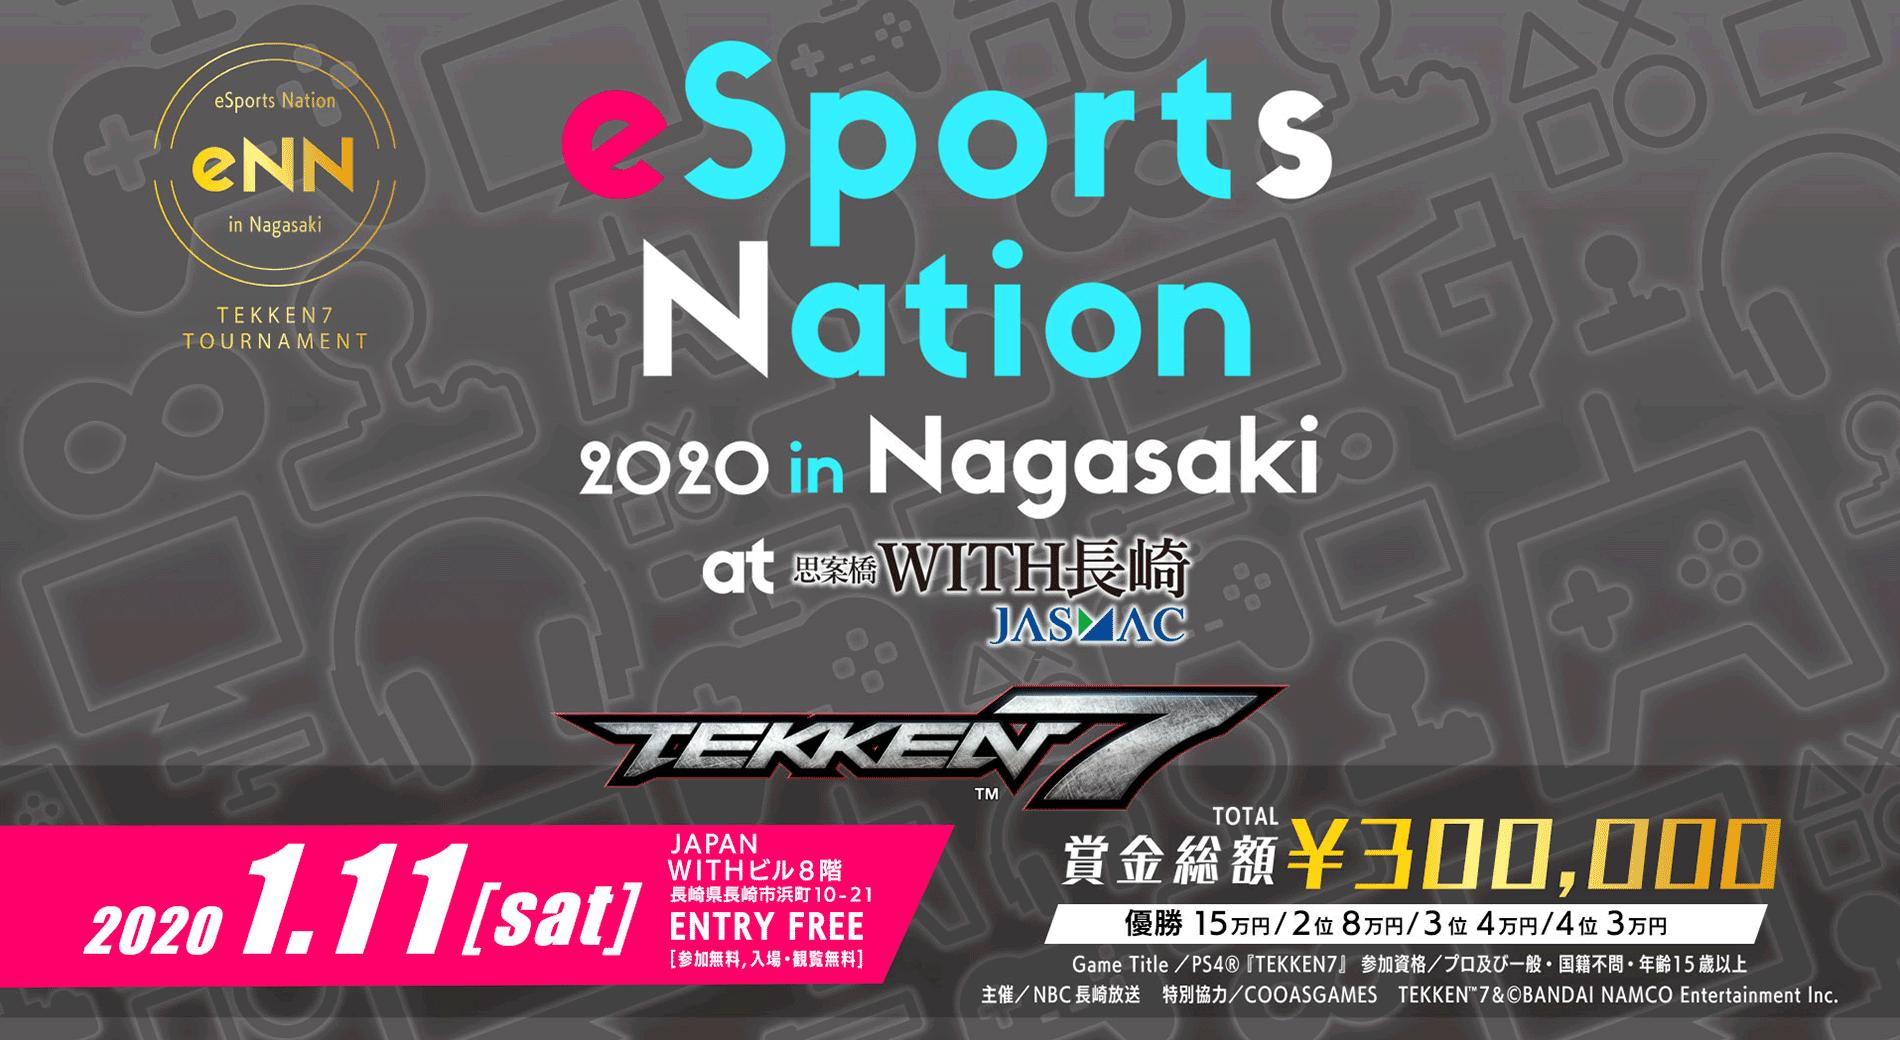 eSports Nation 2019 in Nagasaki